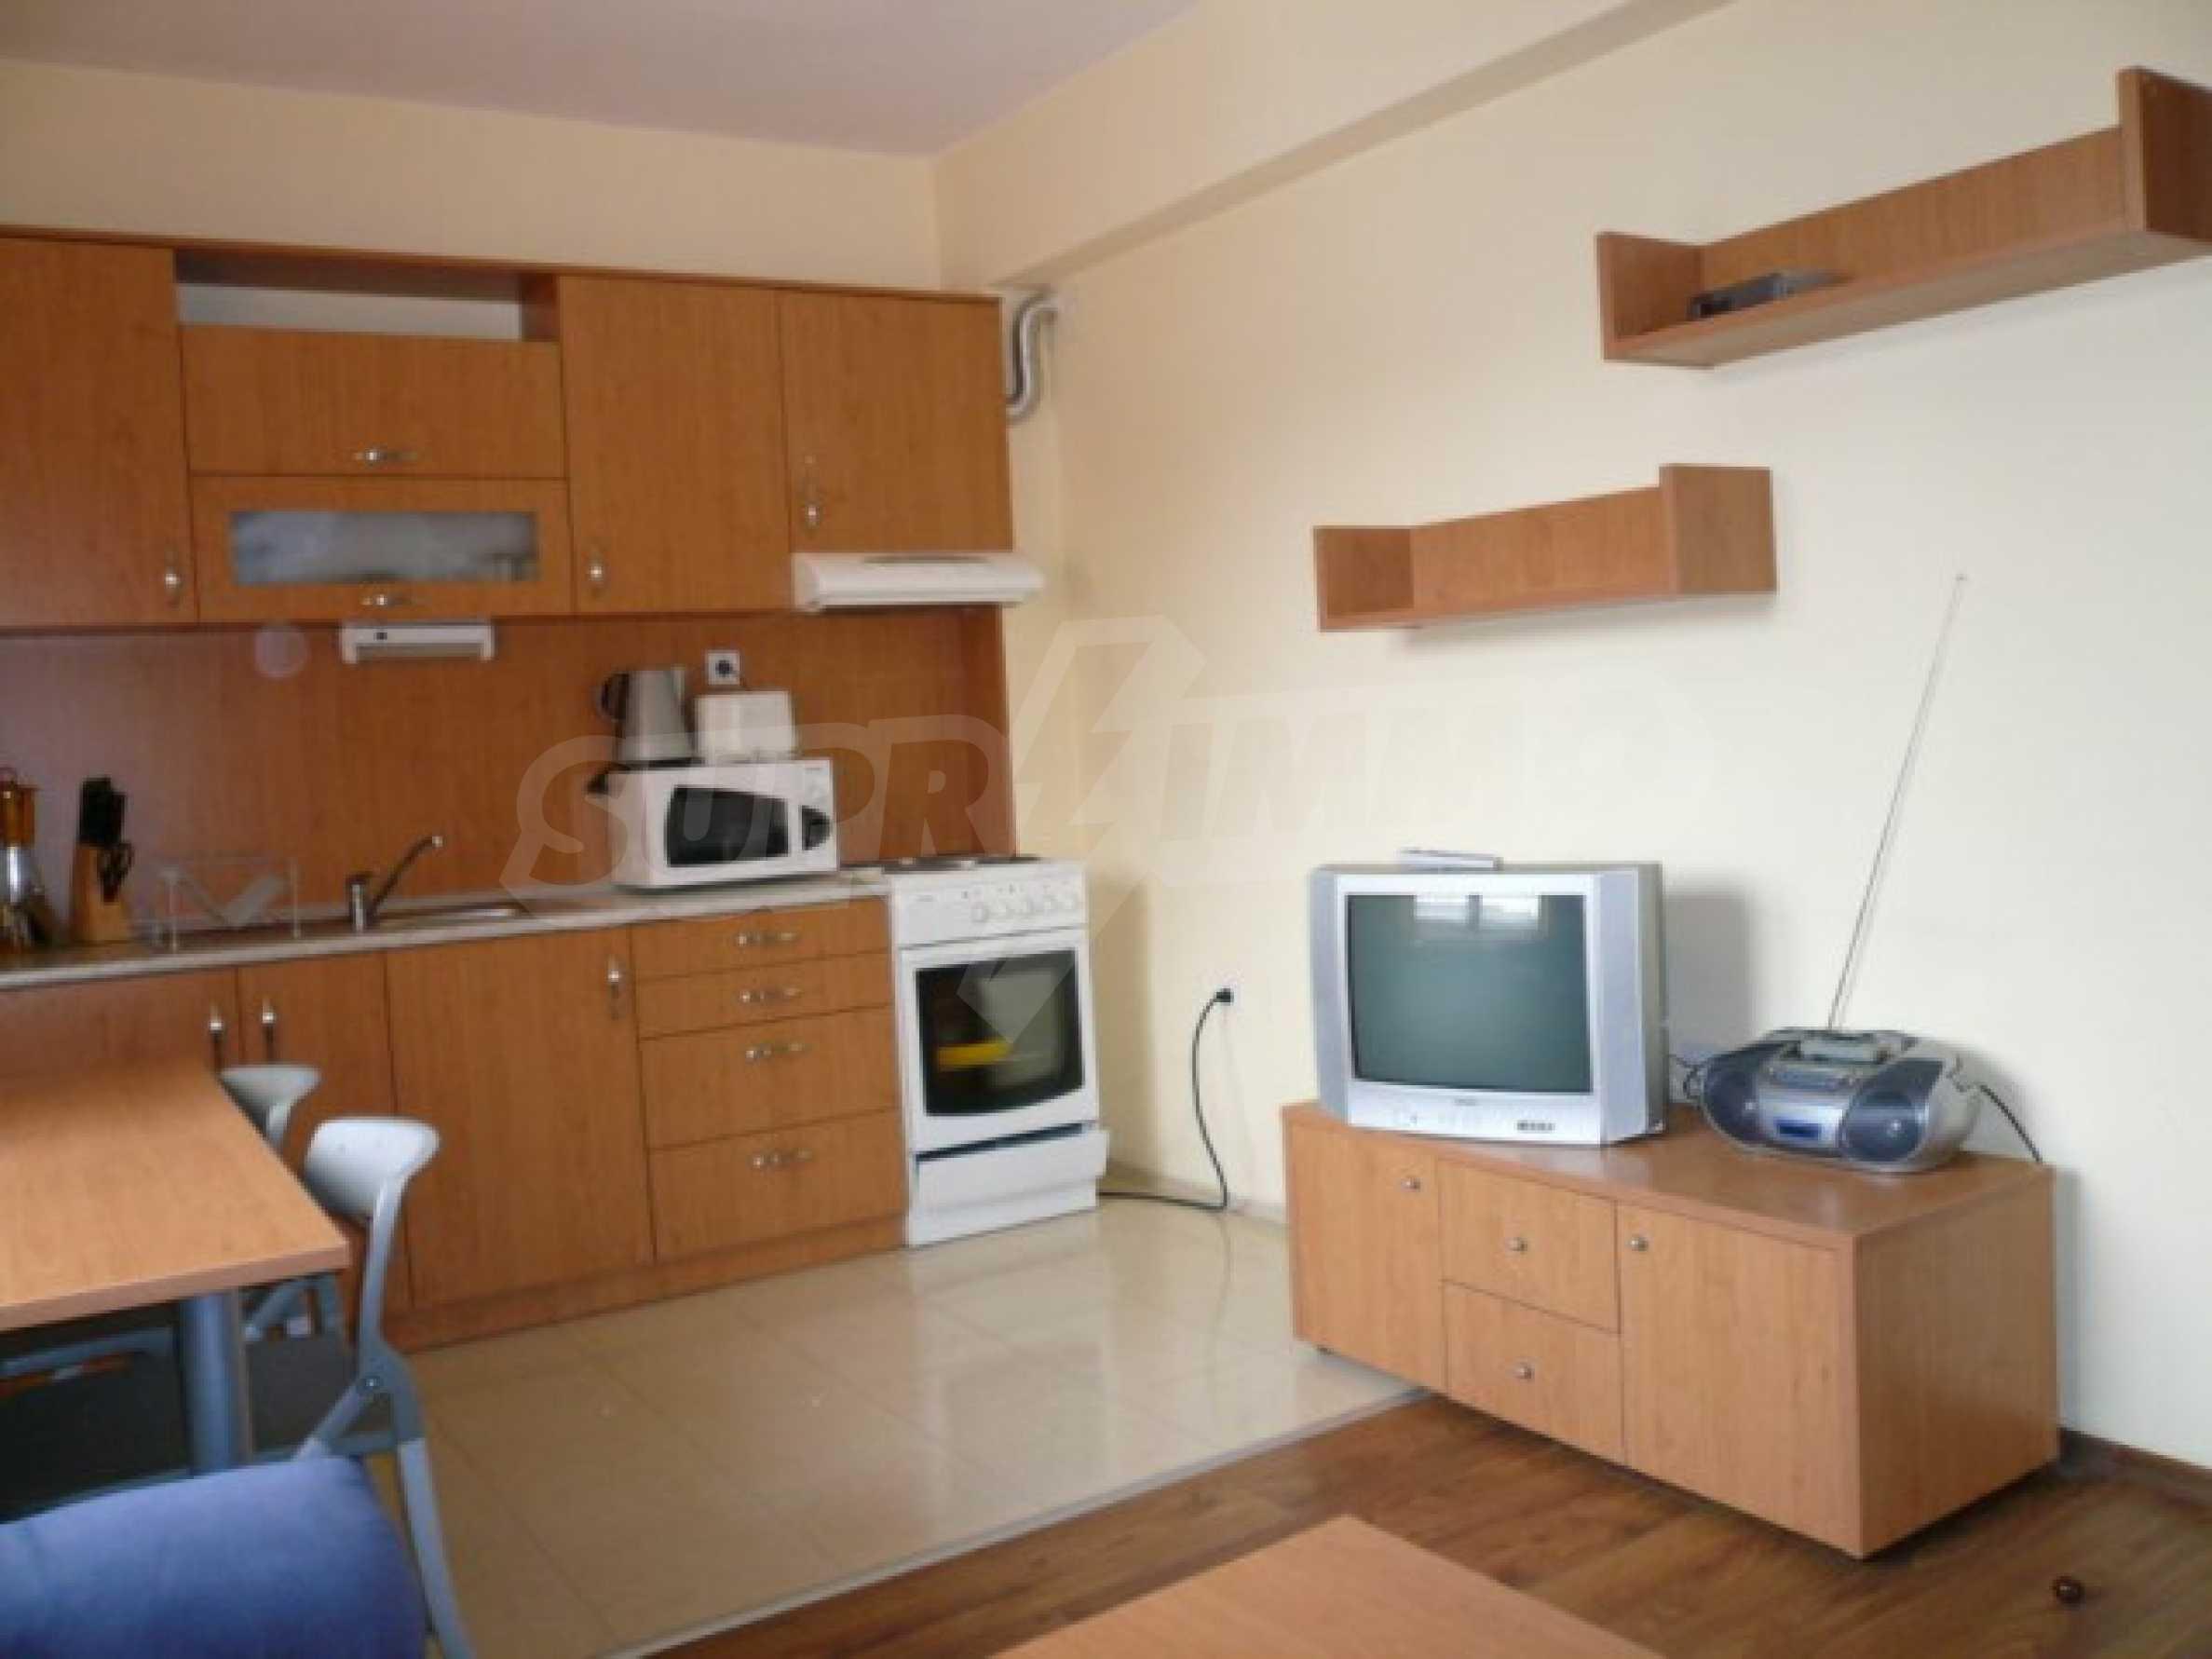 Двустаен апартамент за продажба в гр. Банско 3